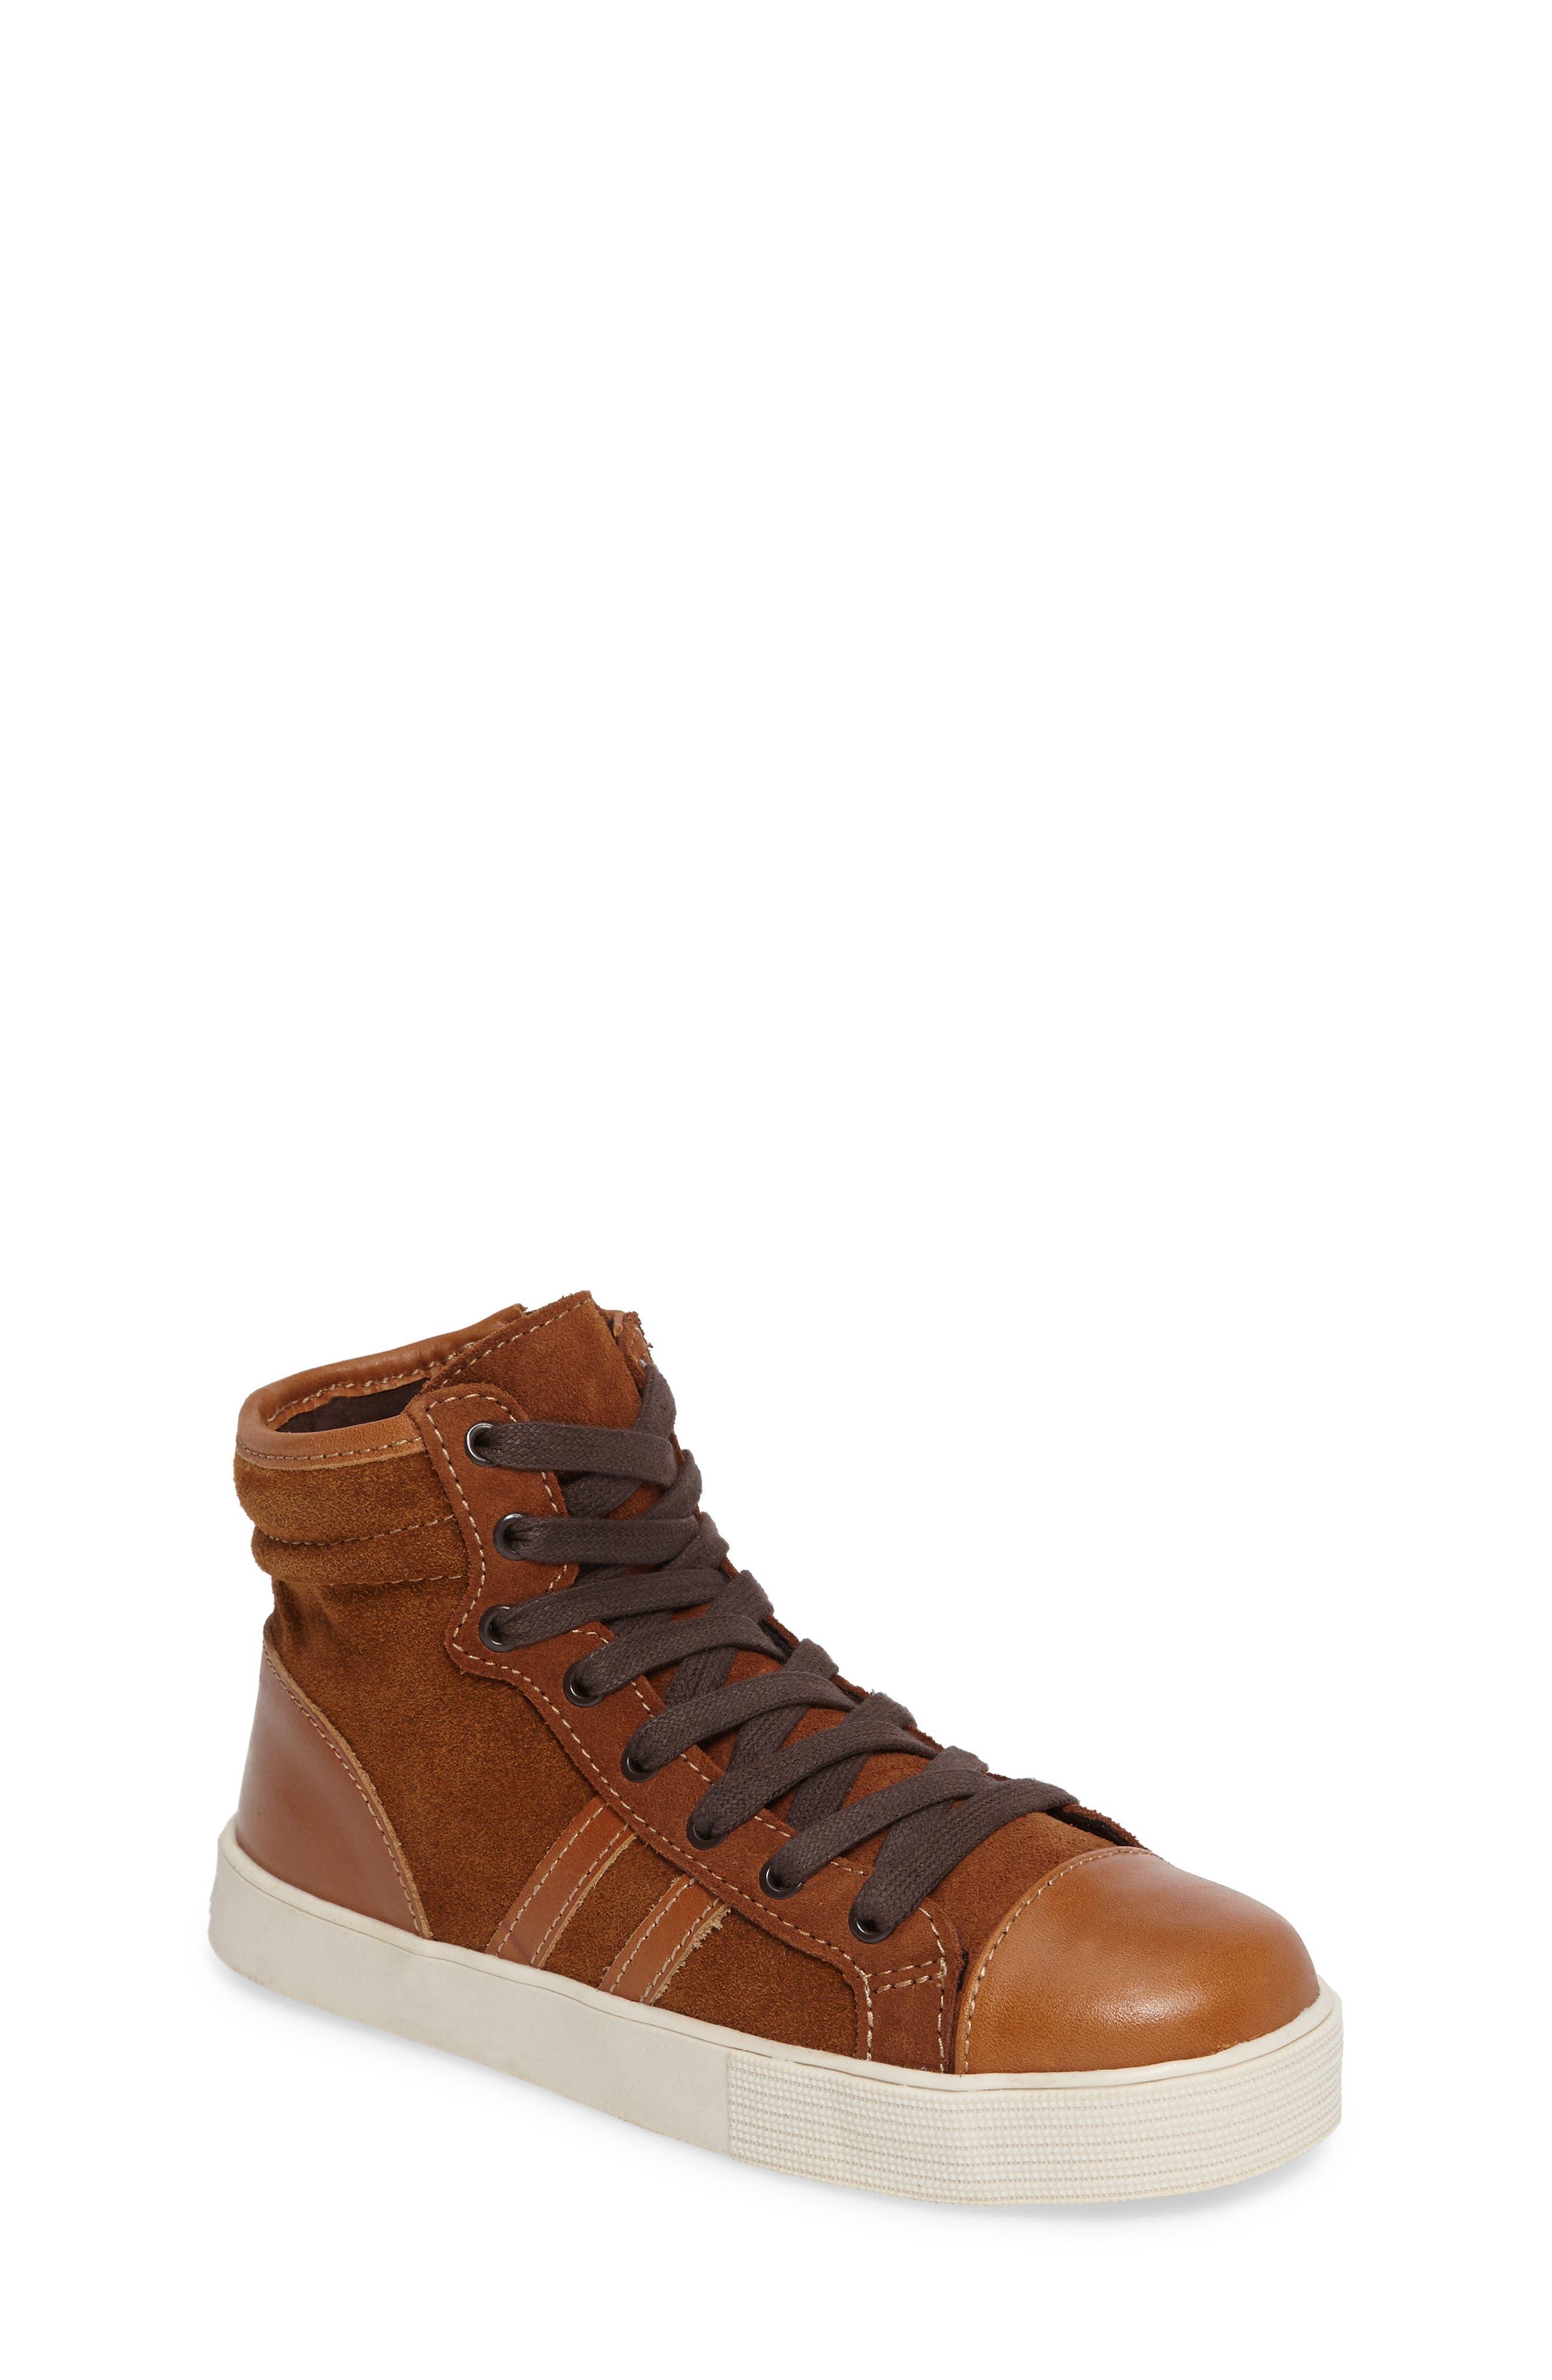 Jay Top High-Top Zip Sneaker,                             Main thumbnail 1, color,                             205